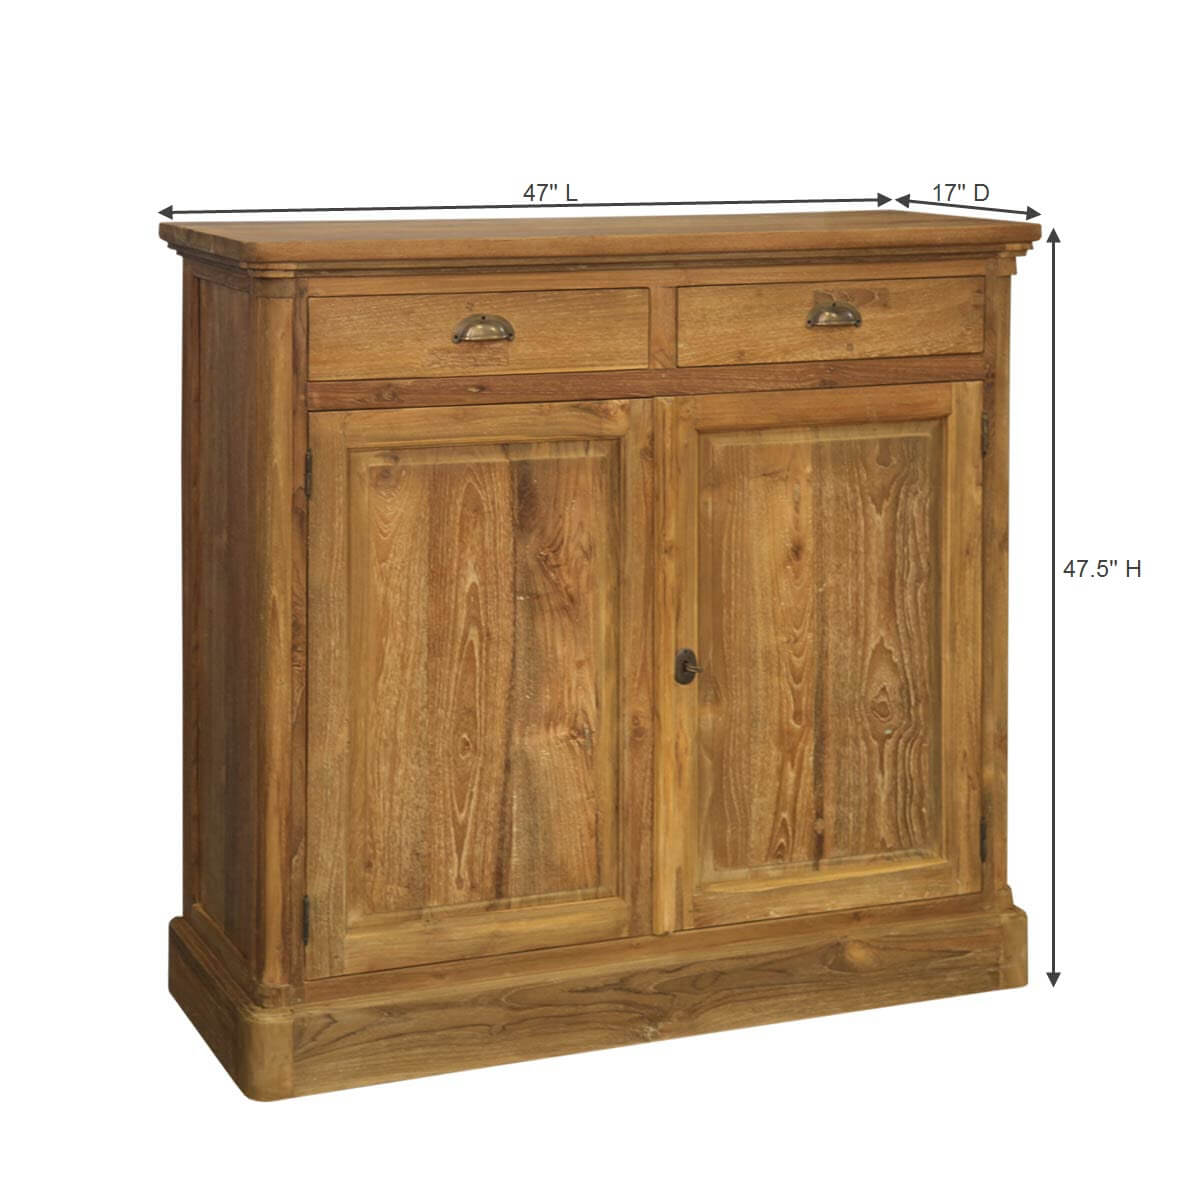 Rustic Foyer Chest : Quiroga rustic reclaimed teak wood drawer hallway accent